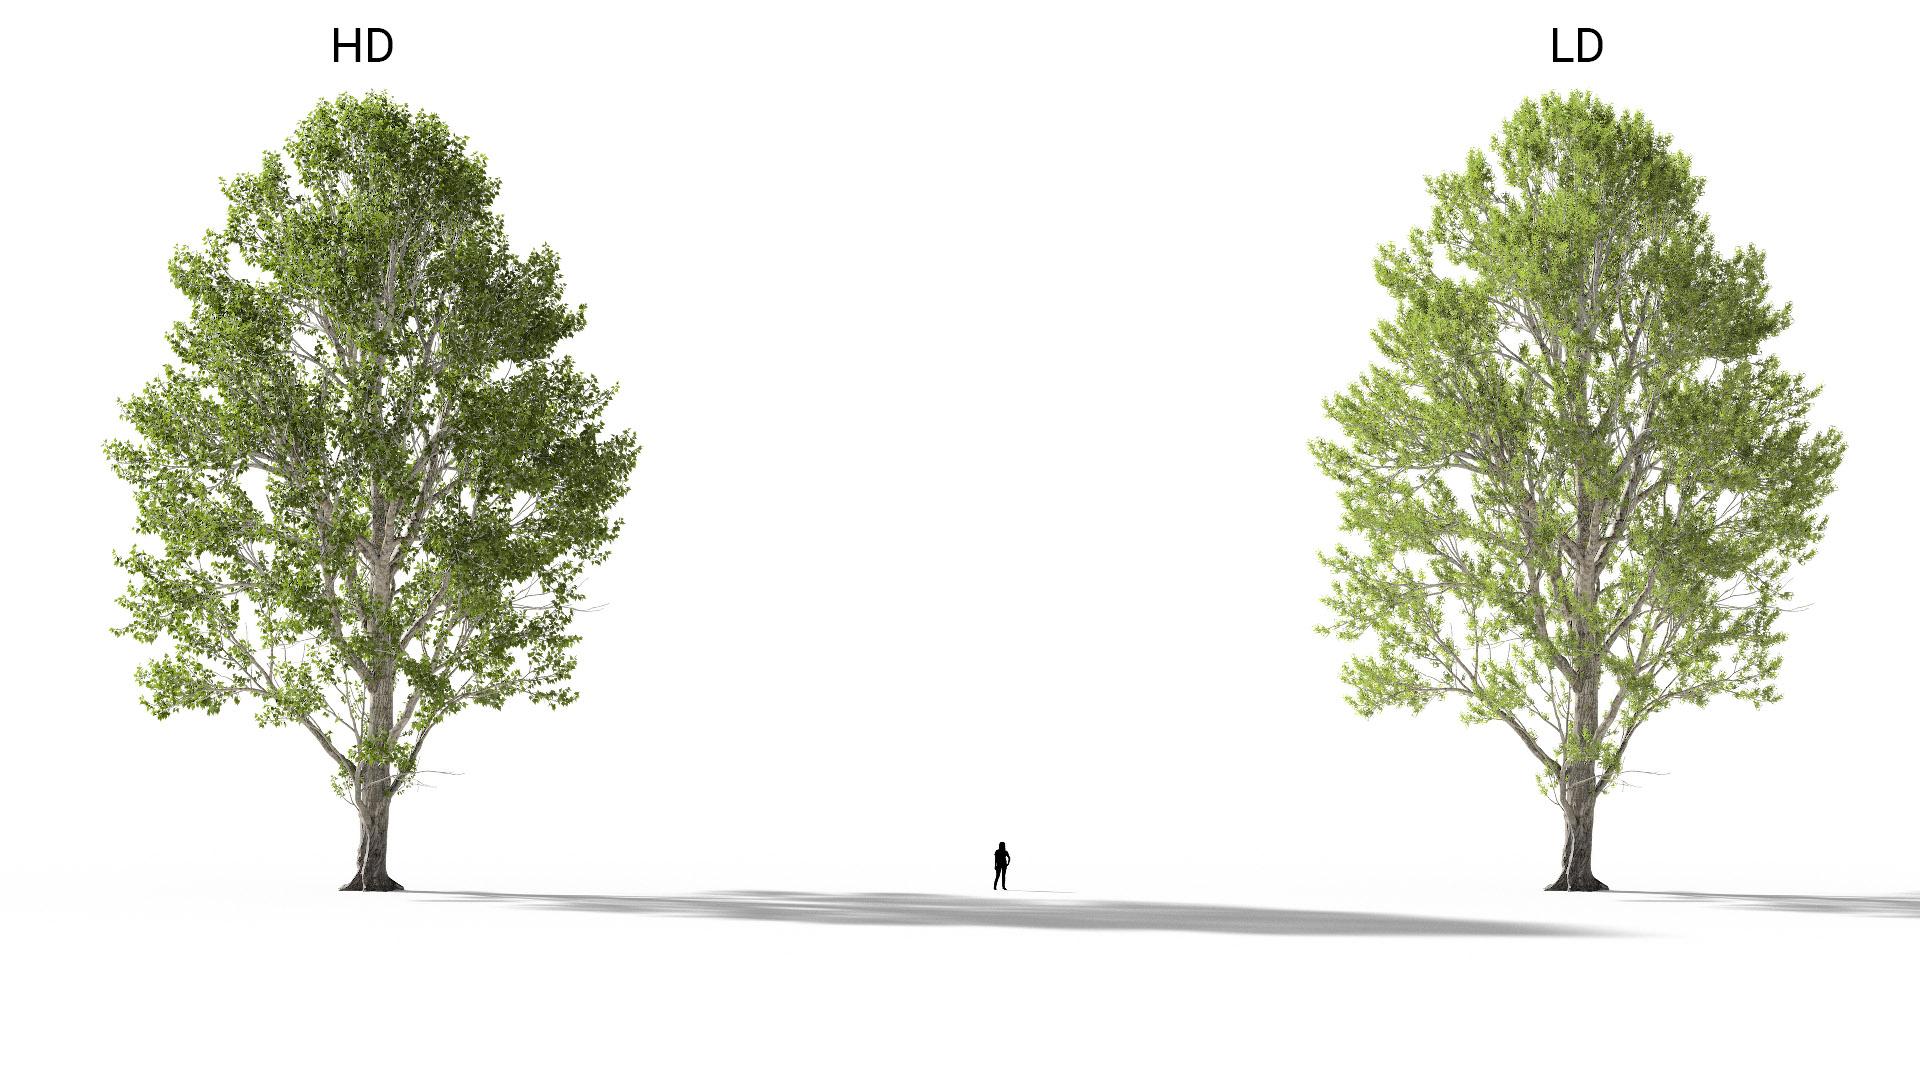 3D model of the Black poplar Populus nigra included versions